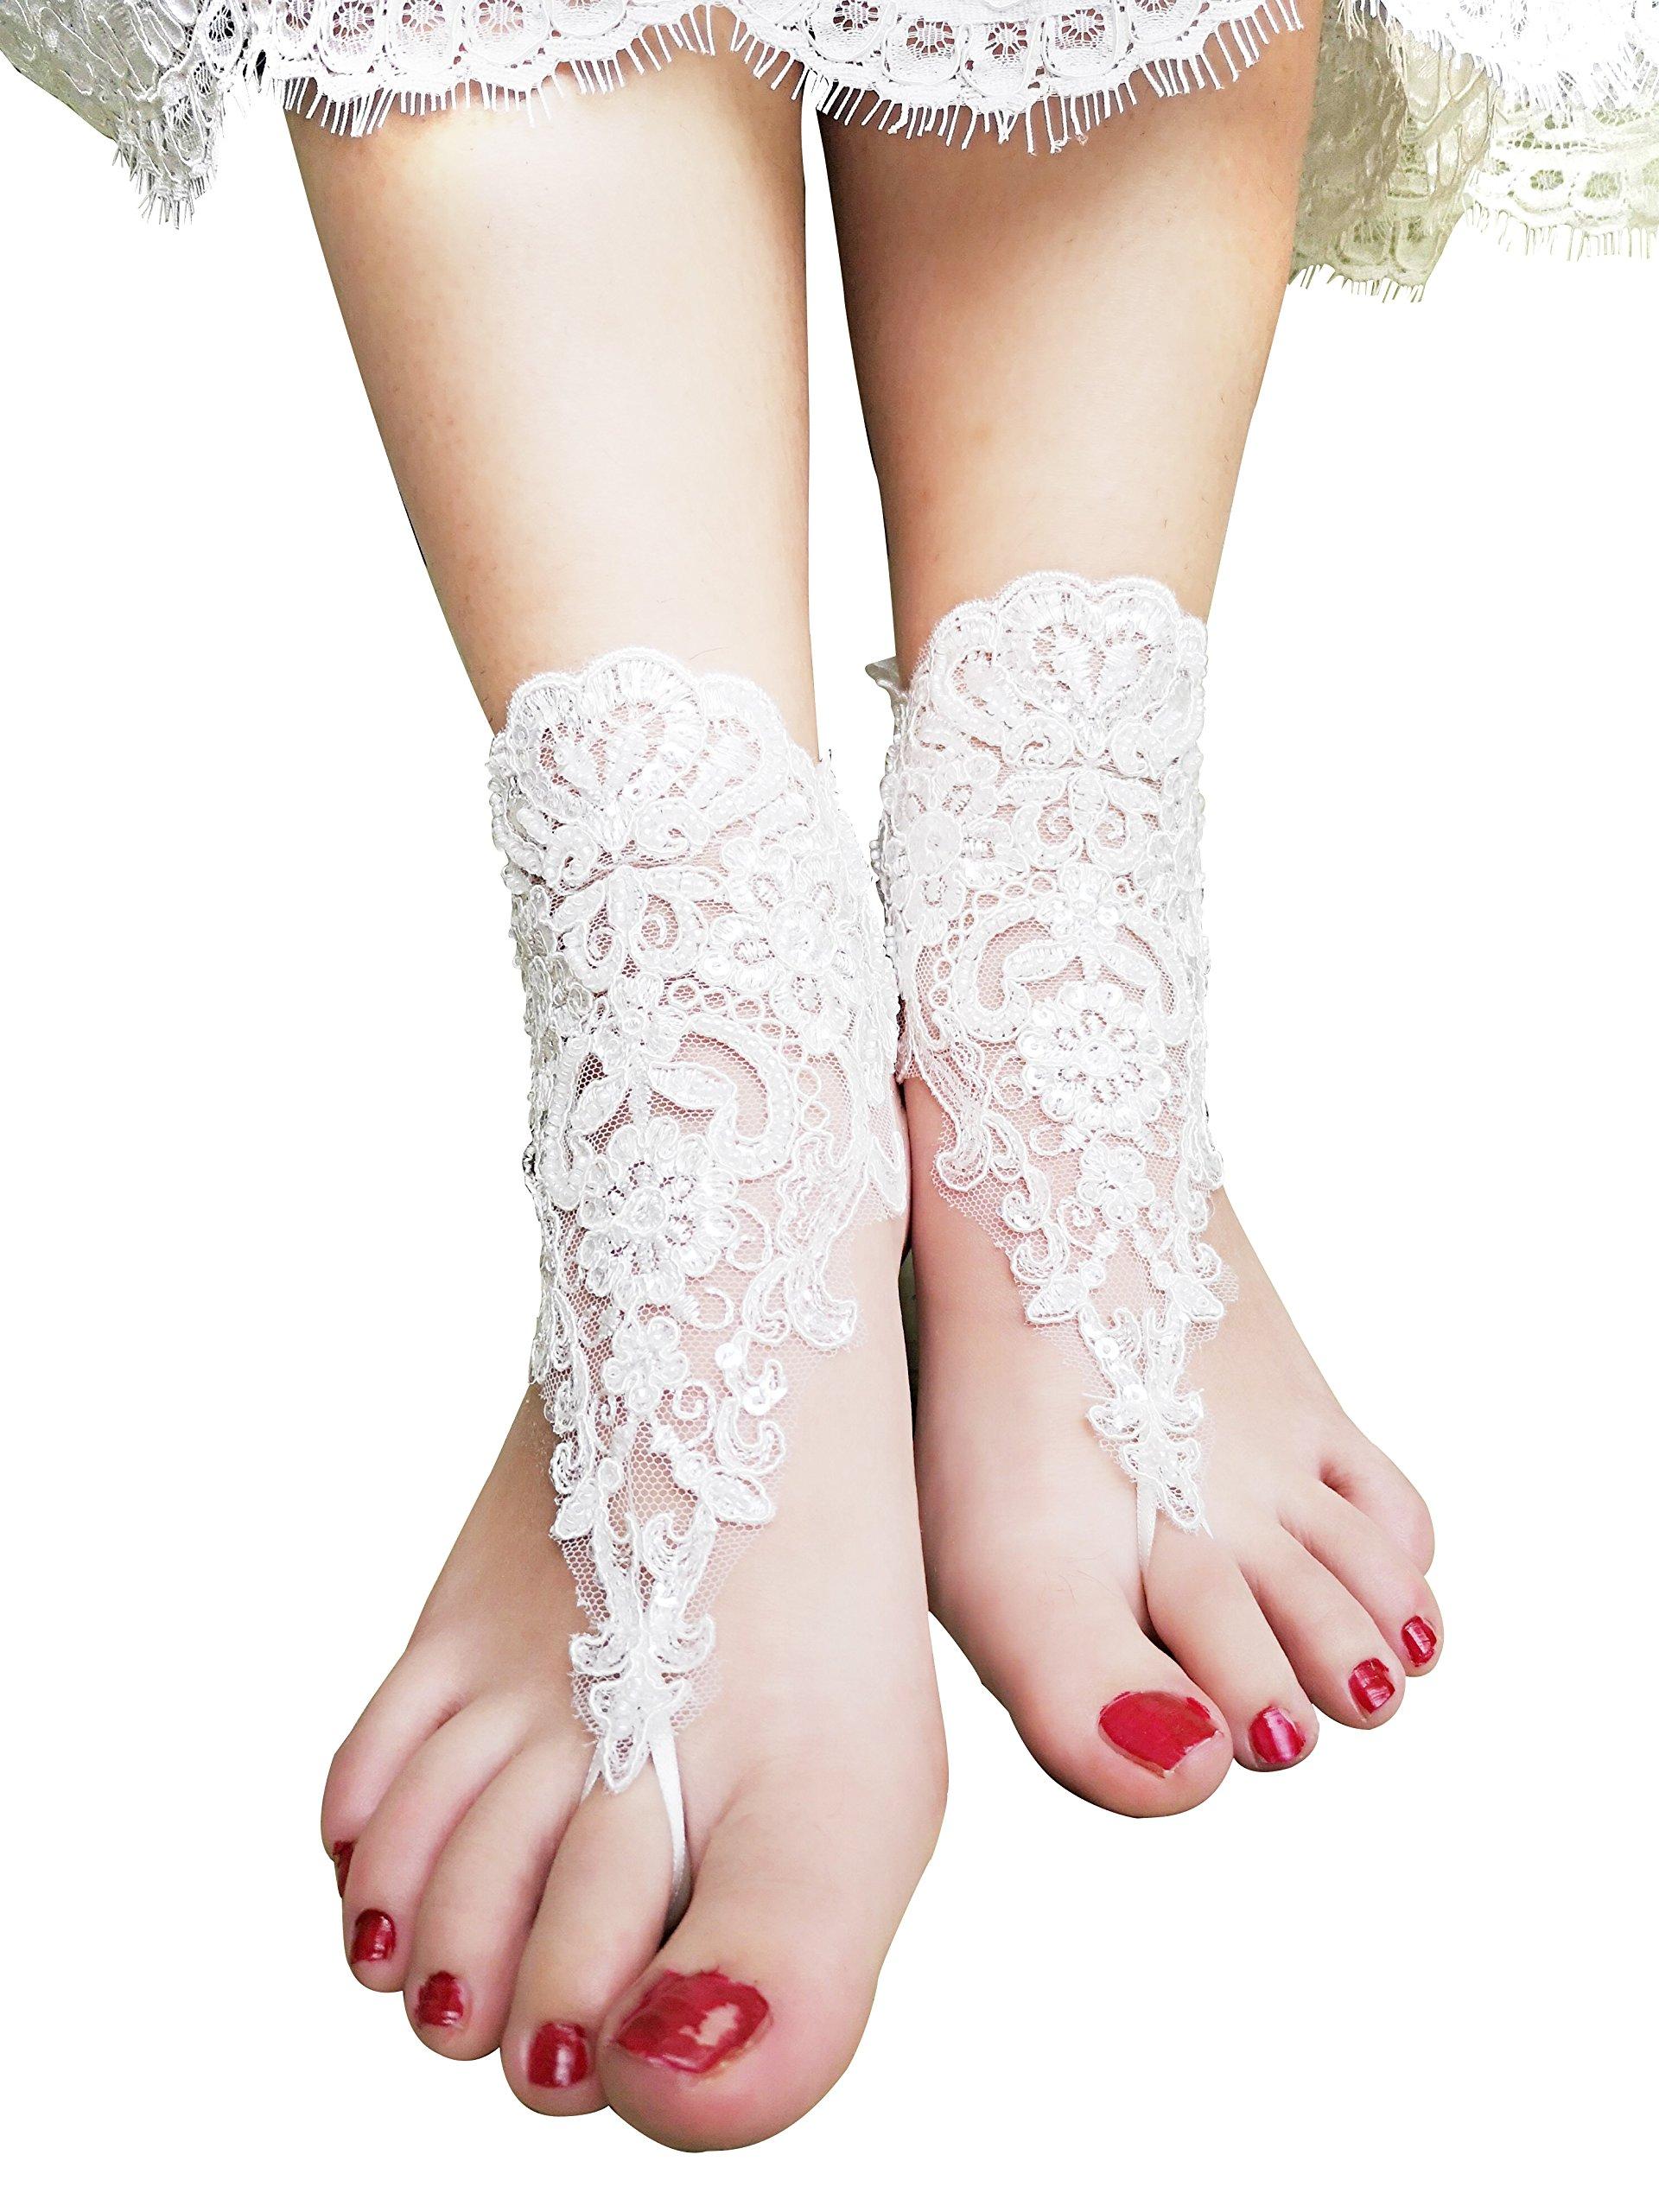 YuRong Lace Barefoot Footless Sandals Beachwear Boho Footwear F01 (Ivory)